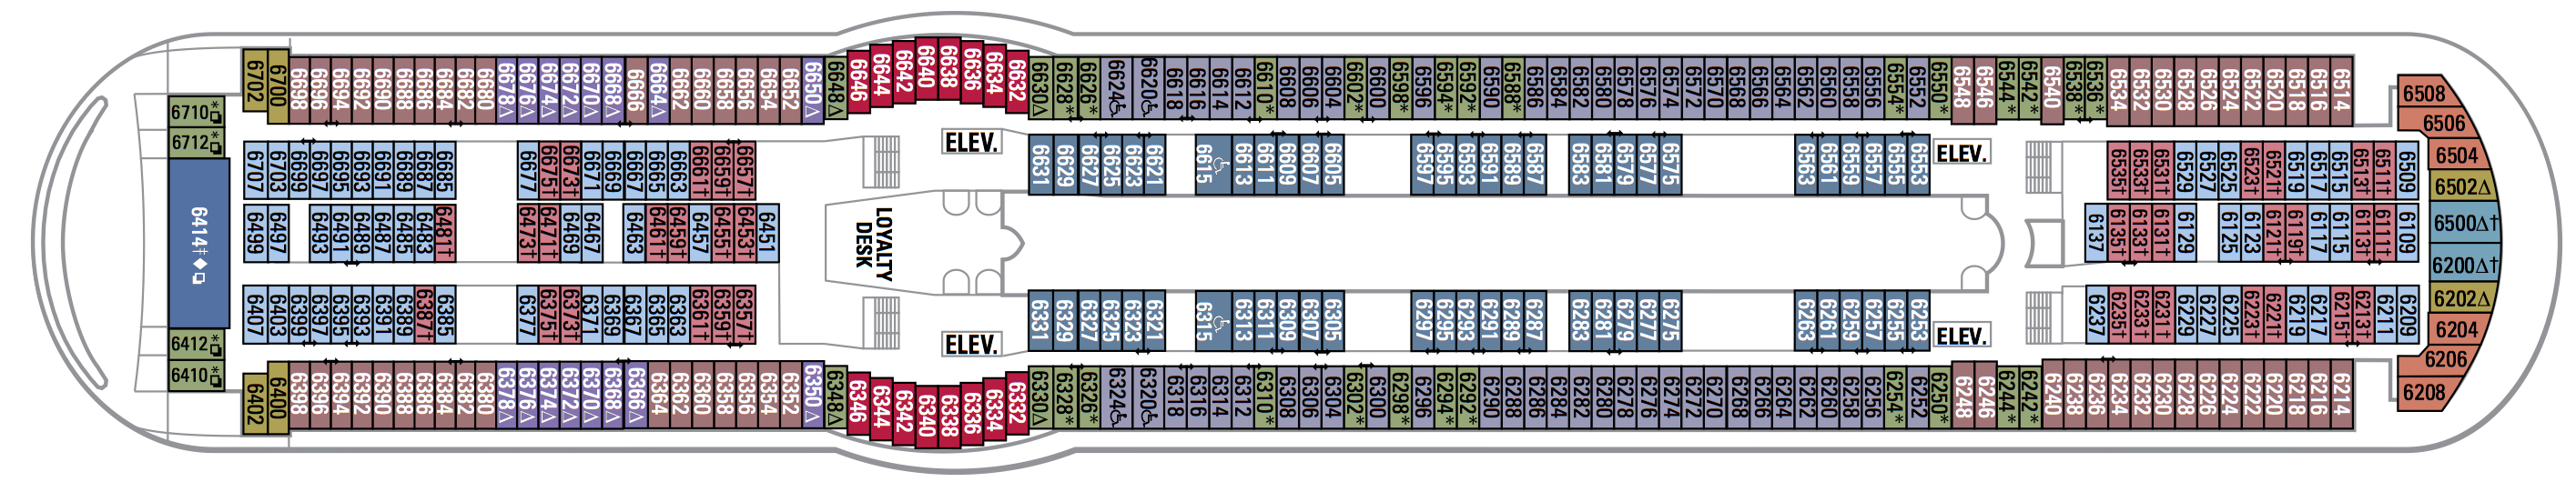 Royal Caribbean- Freedom of the Seas Deck  6.jpeg